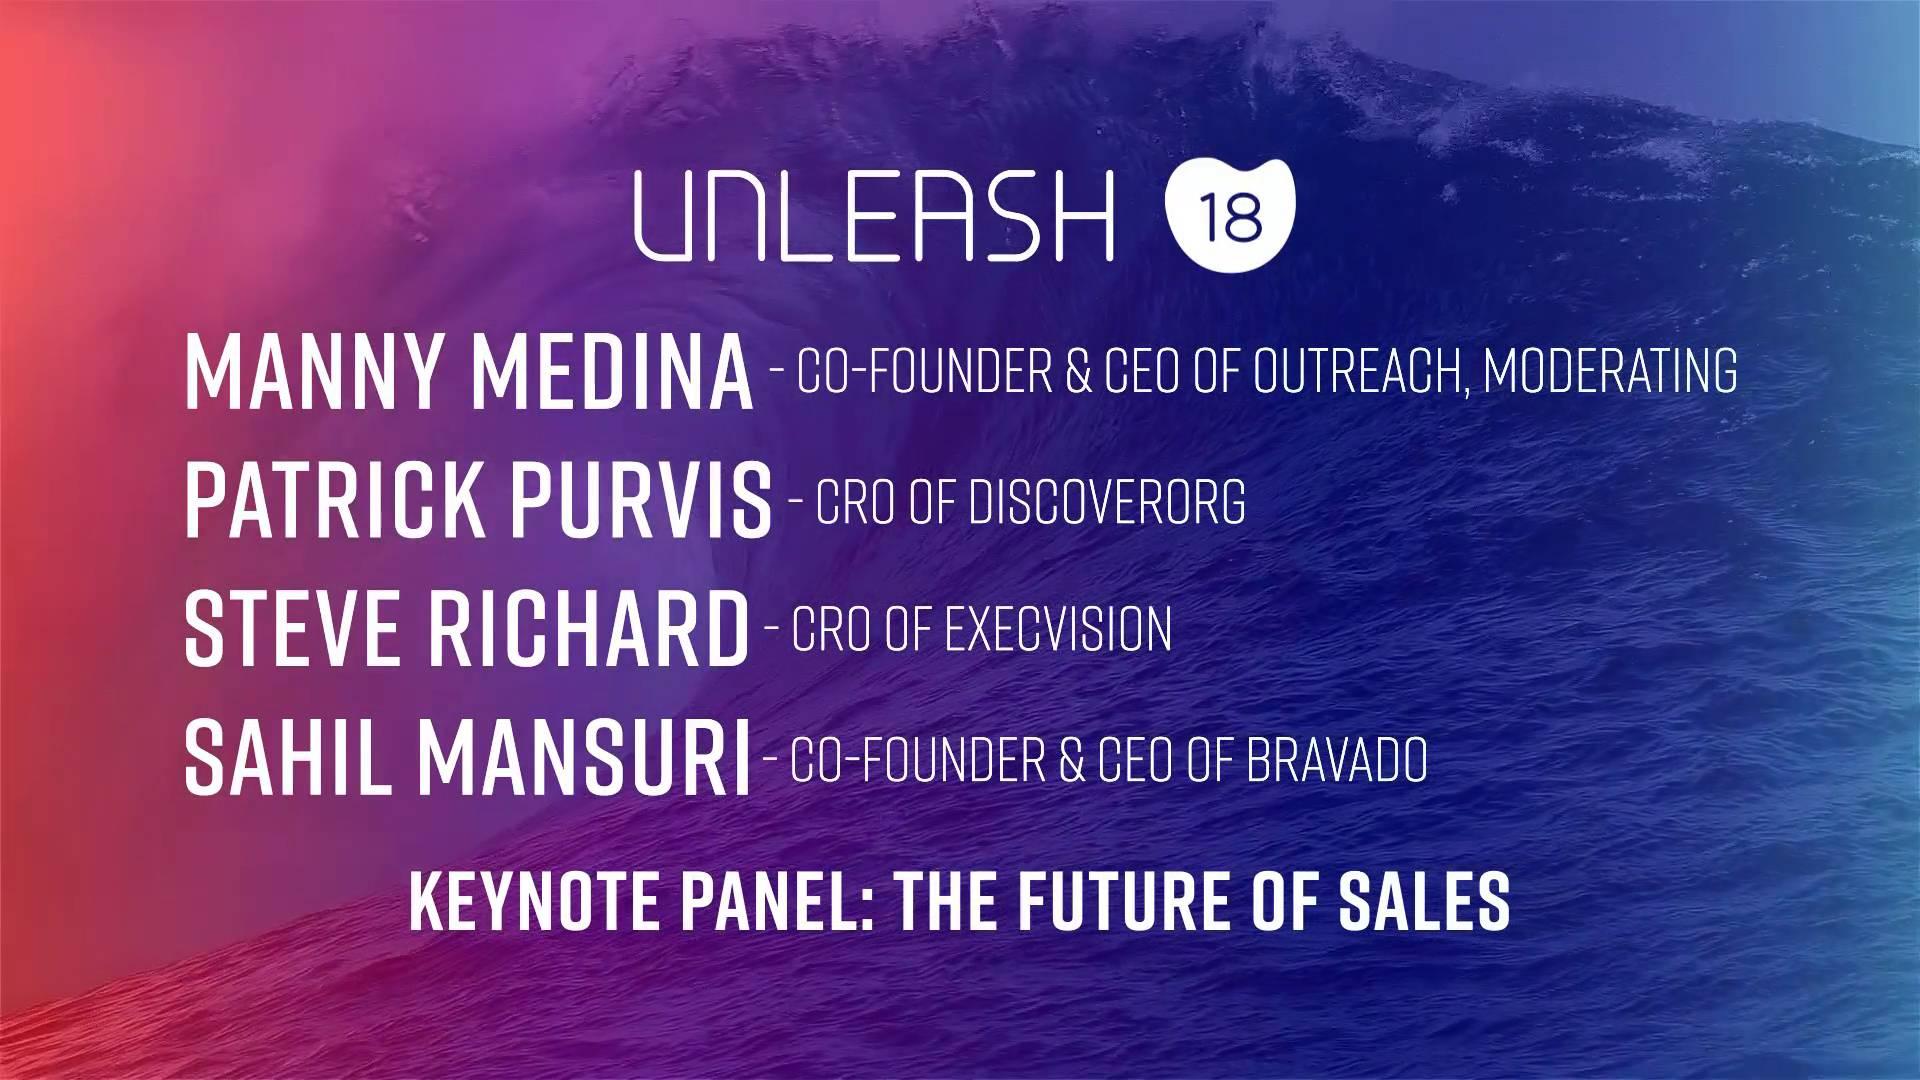 Unleash 18